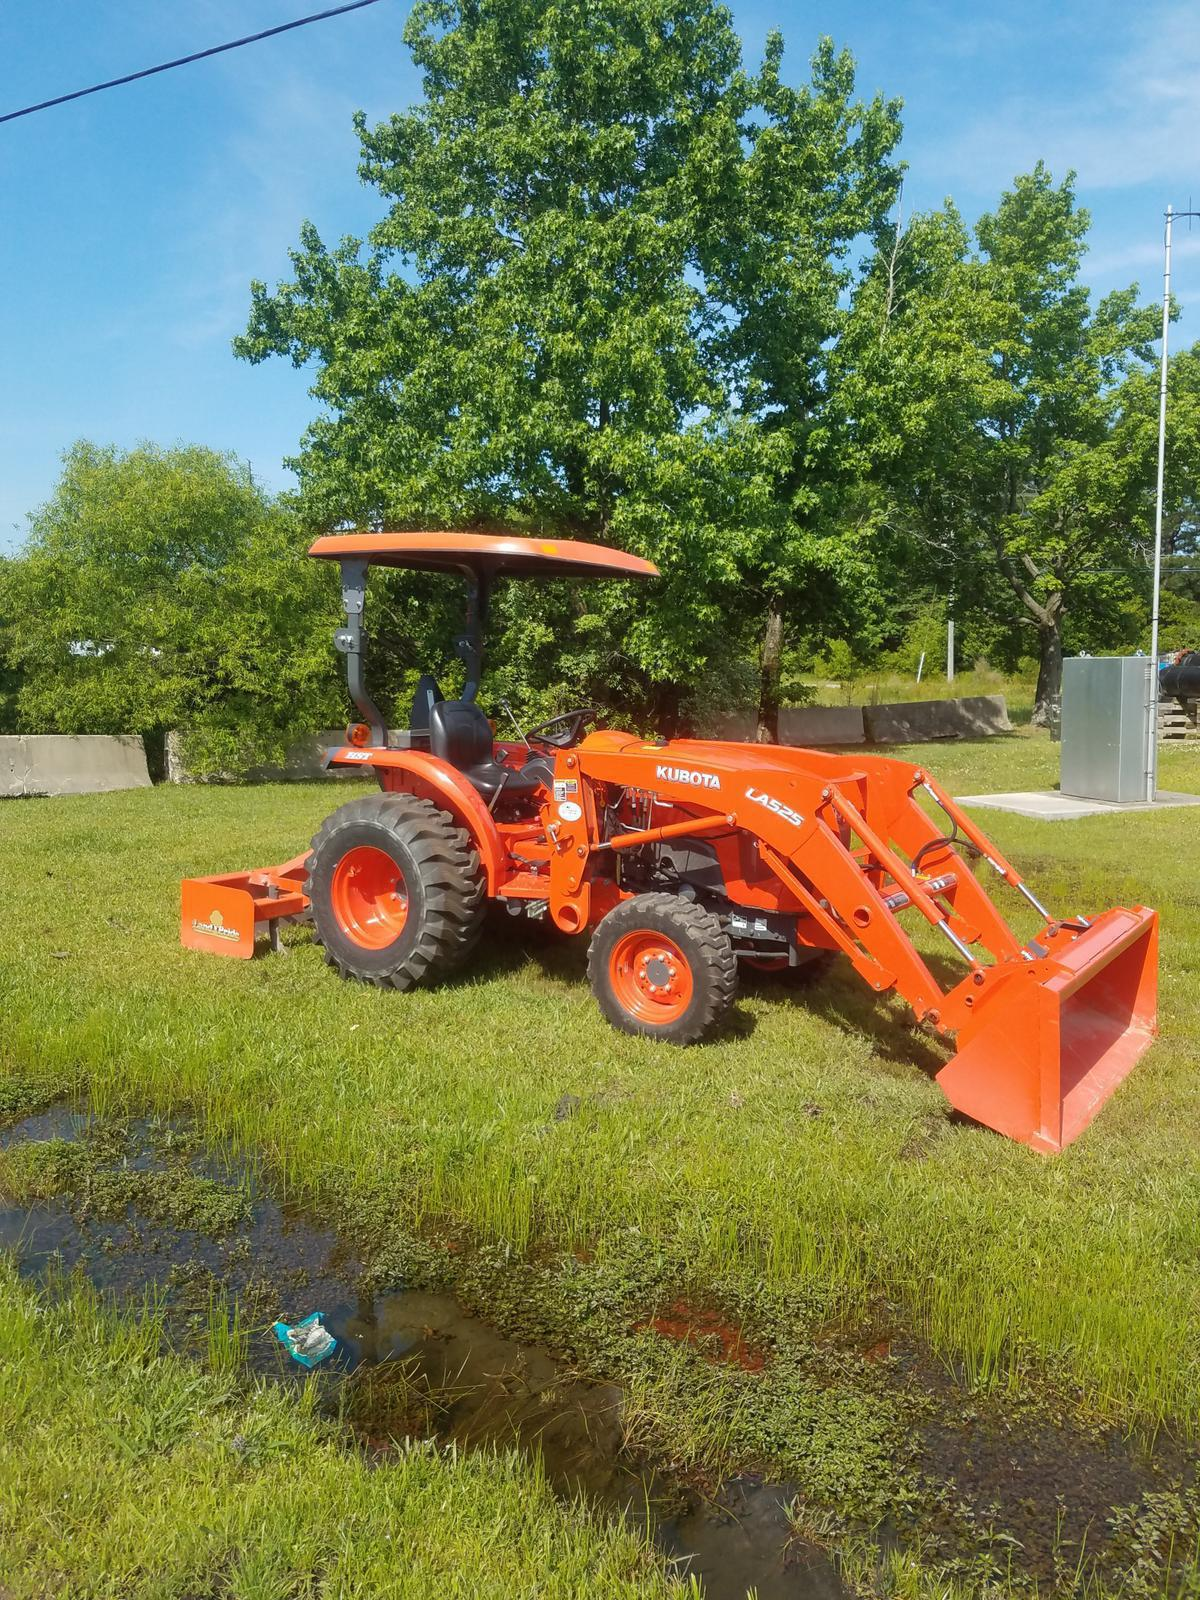 Inventory Stevenson Tractor, Inc  Chesapeake, VA (757) 420-4220